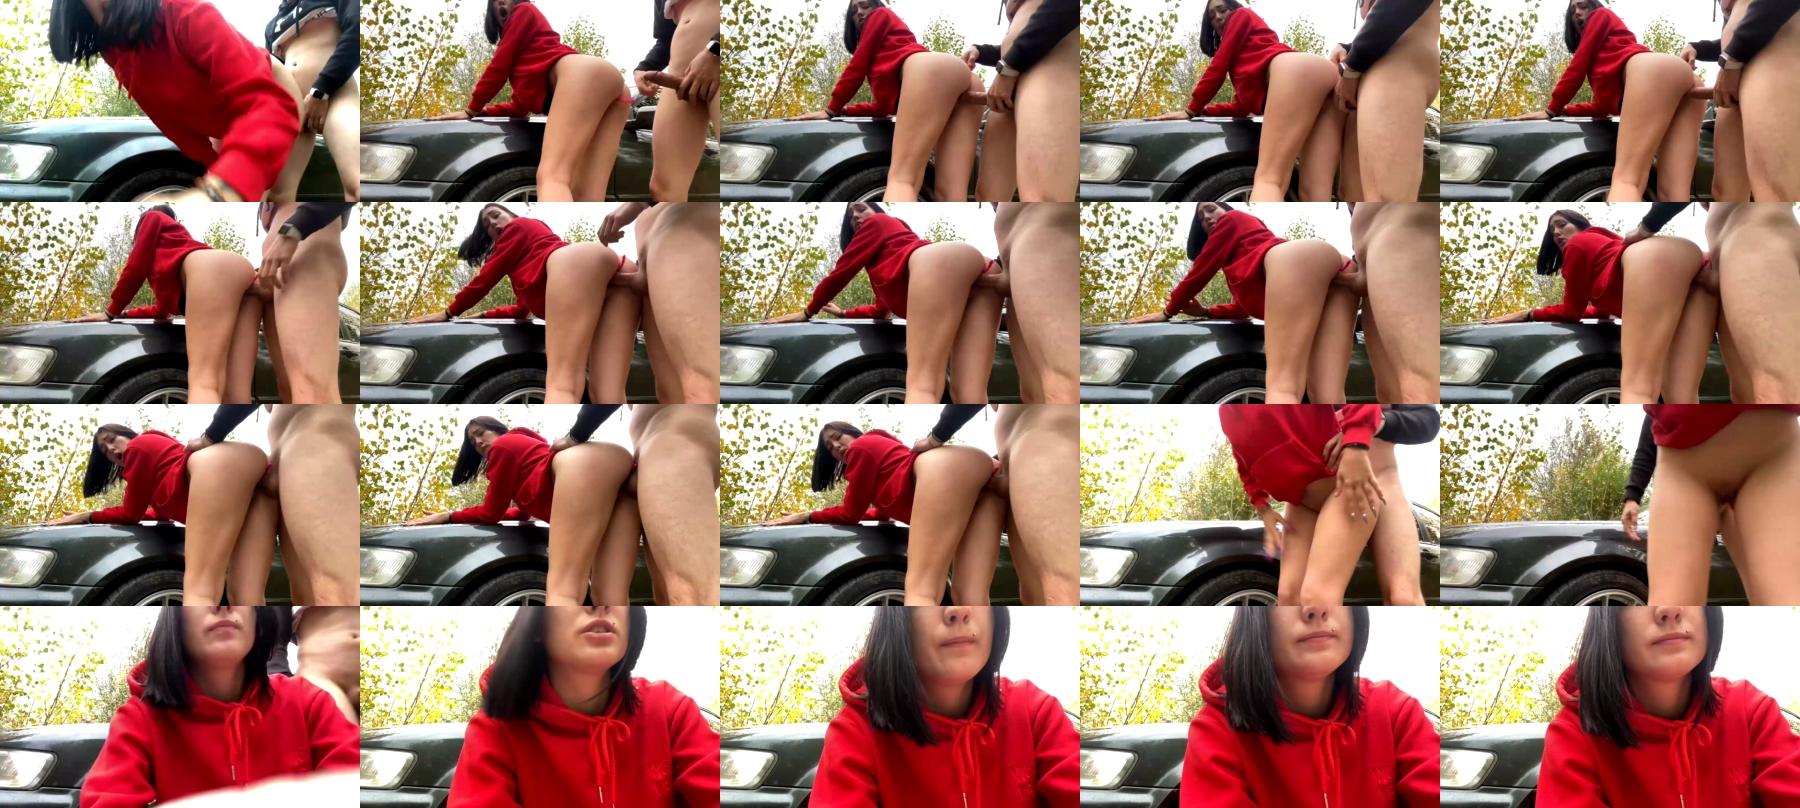 Sasha0vay Webcam CAM SHOW @ Chaturbate 15-09-2021